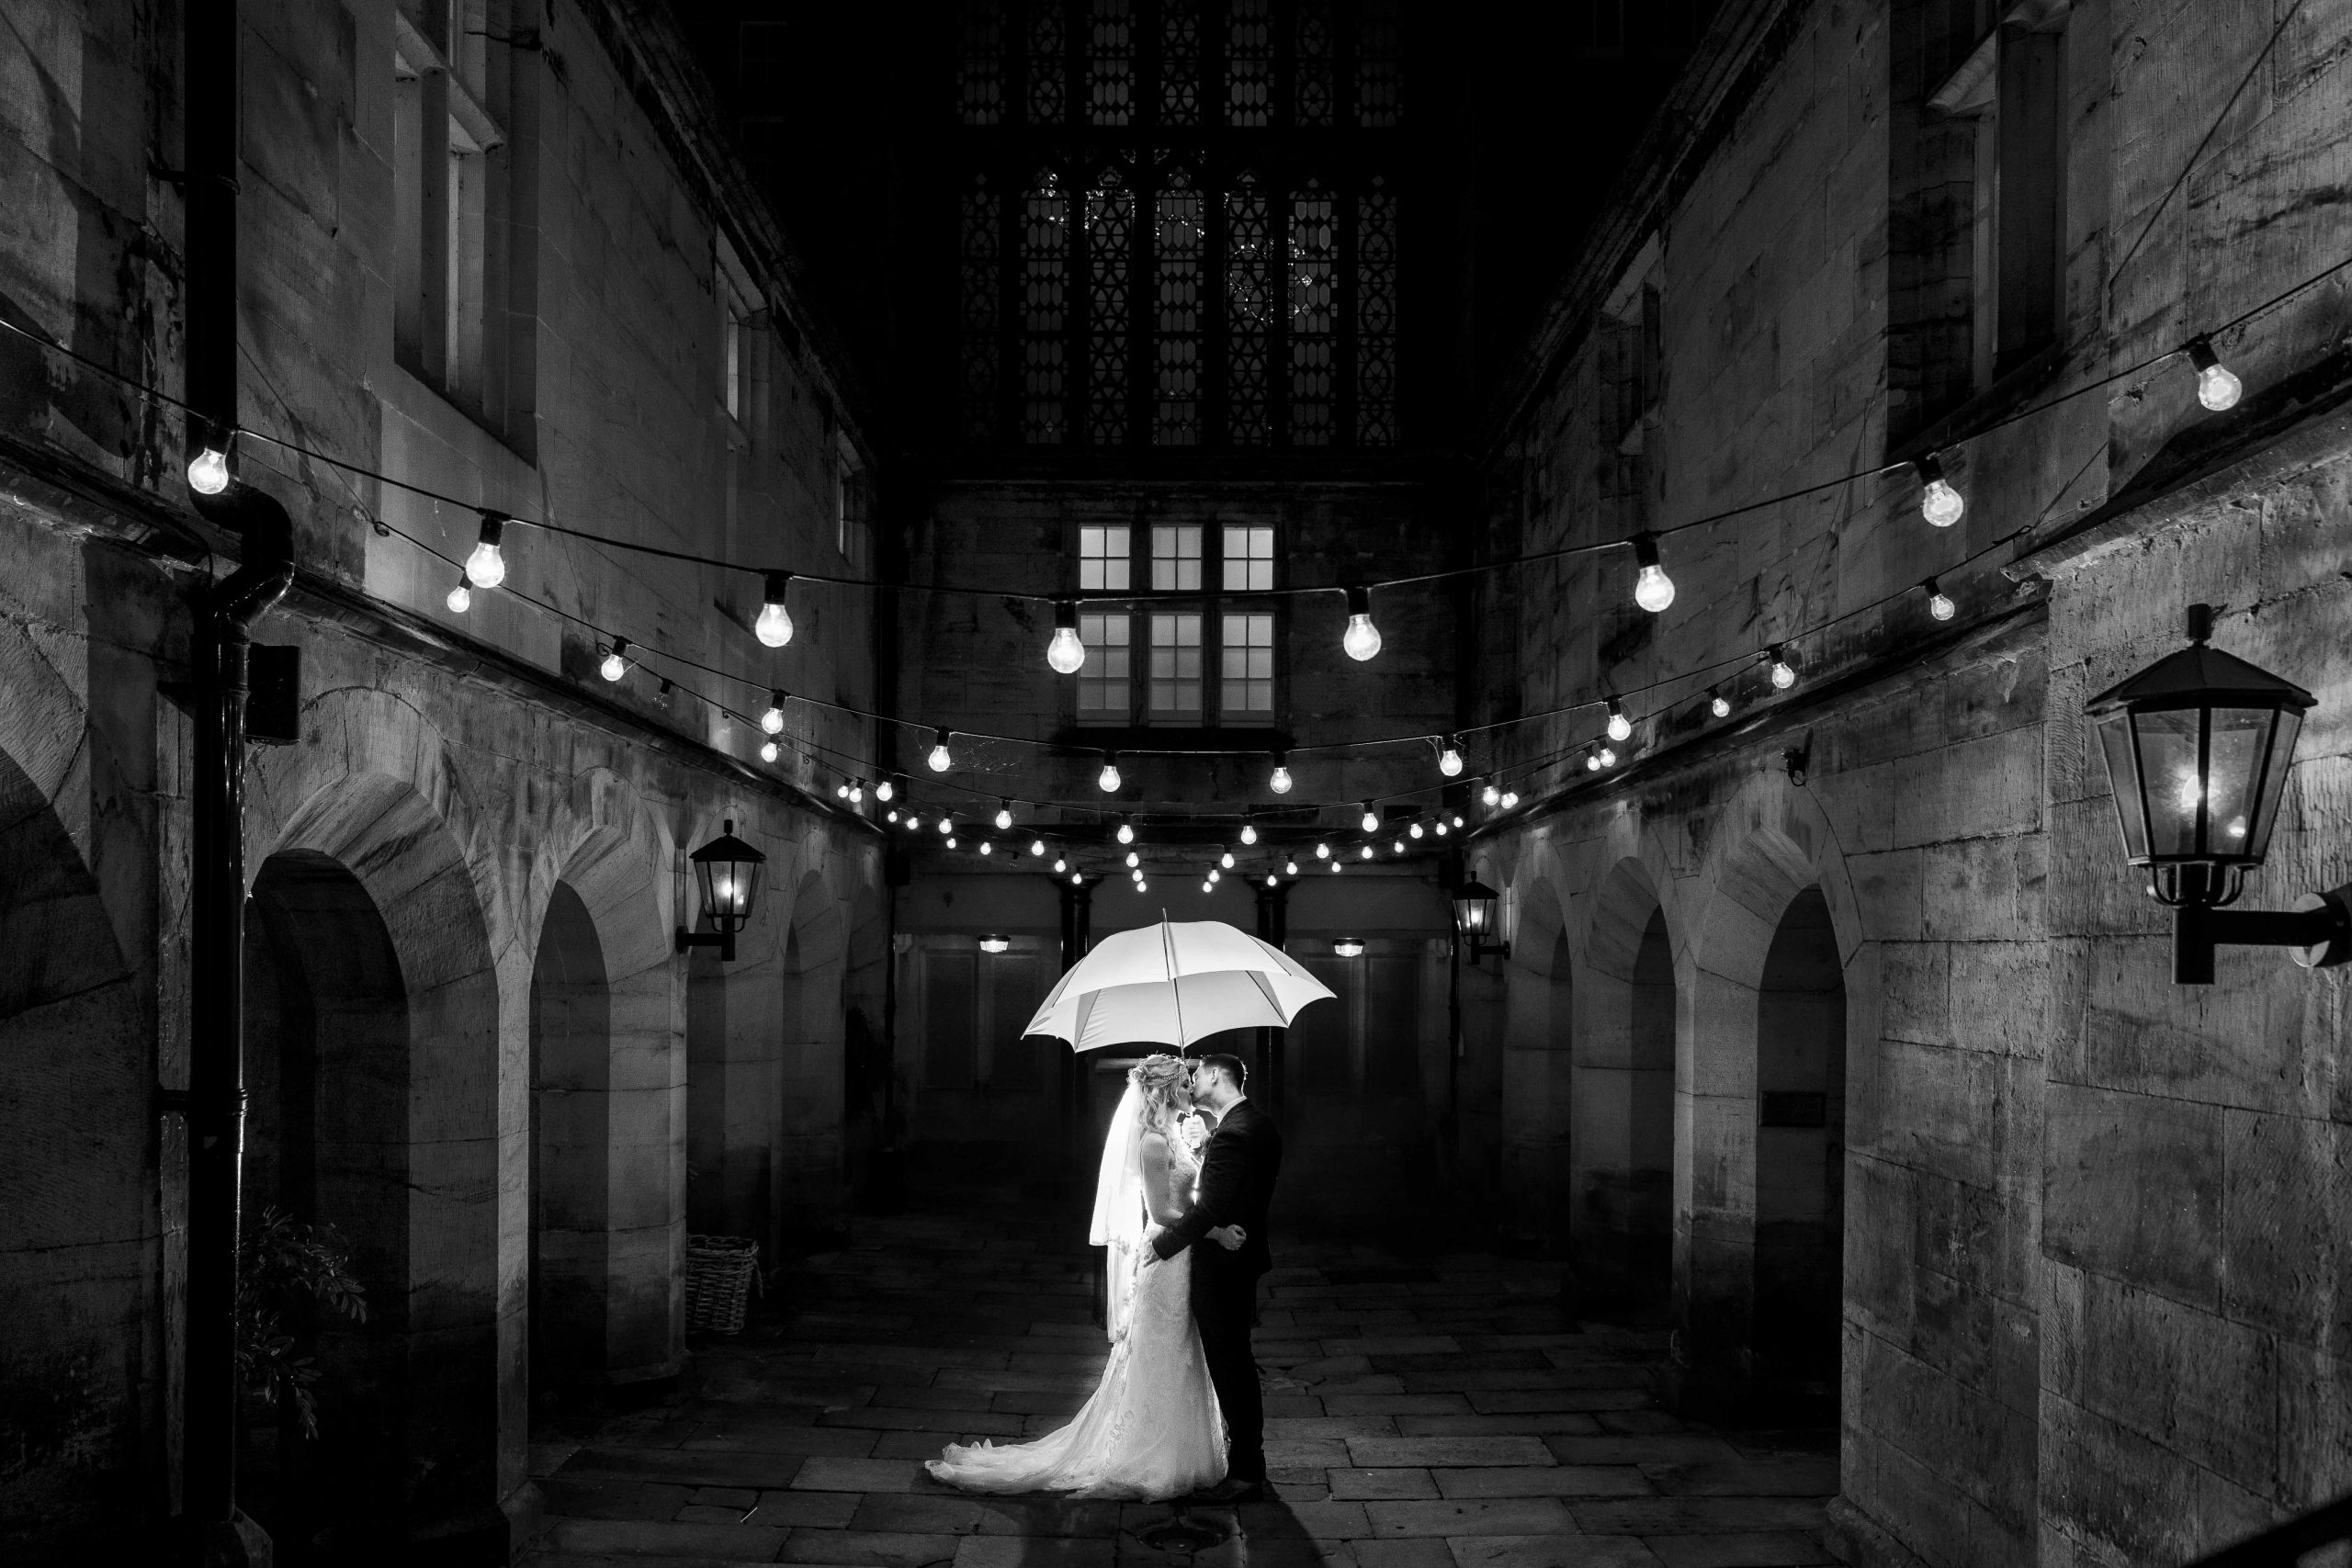 Black and white wedding photography at matfen hall, Northumberland